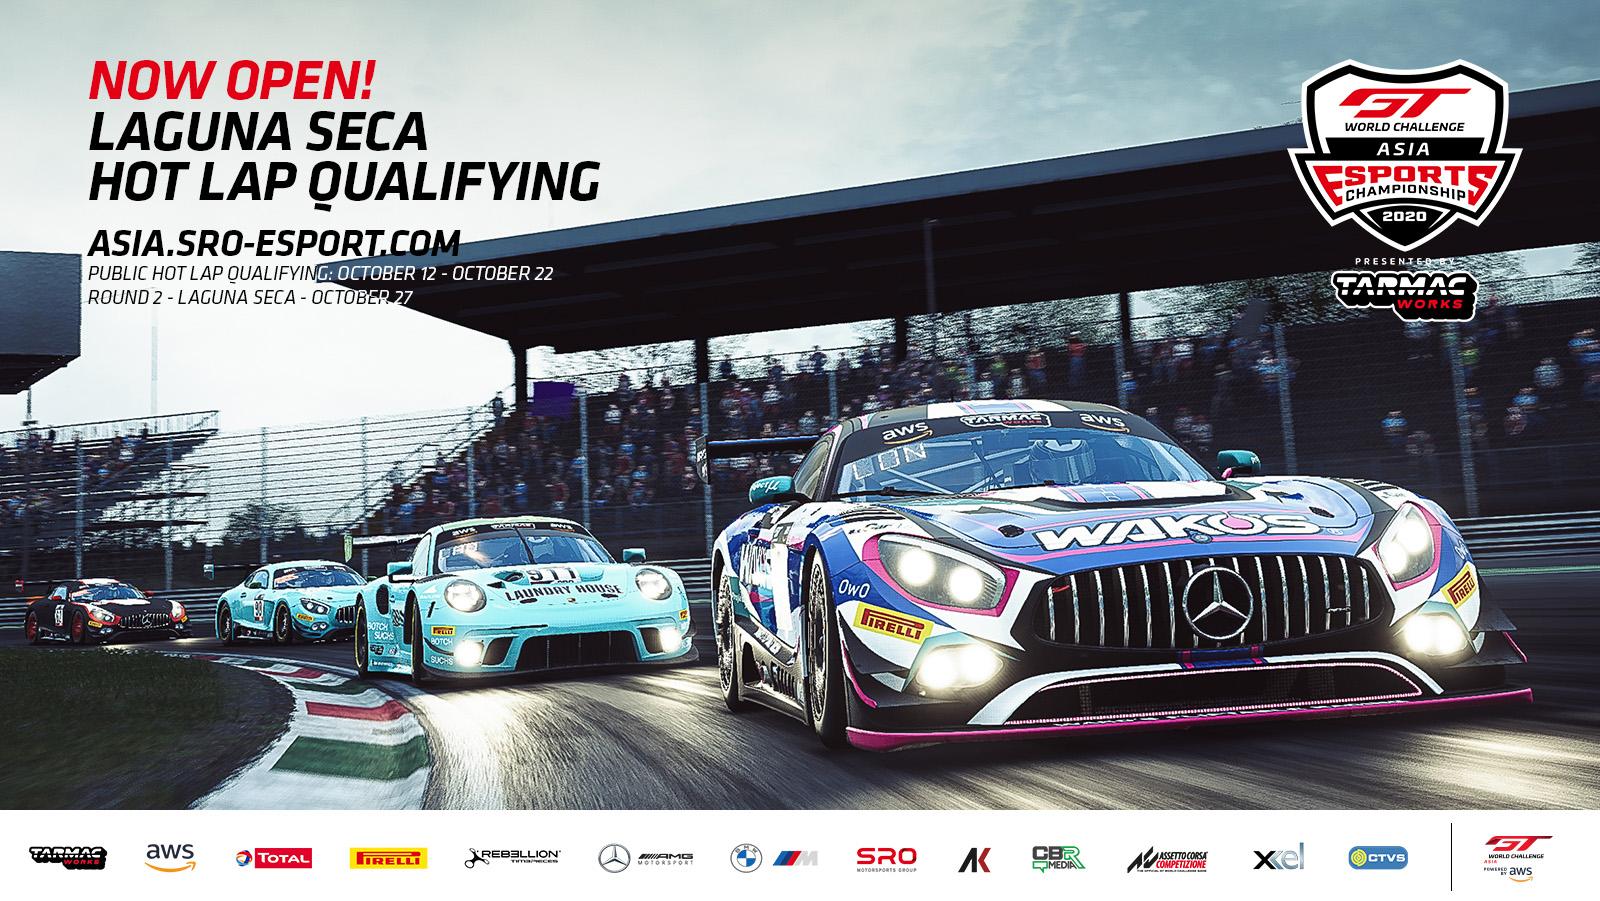 Esports: Laguna Seca public hot lap qualifying now open